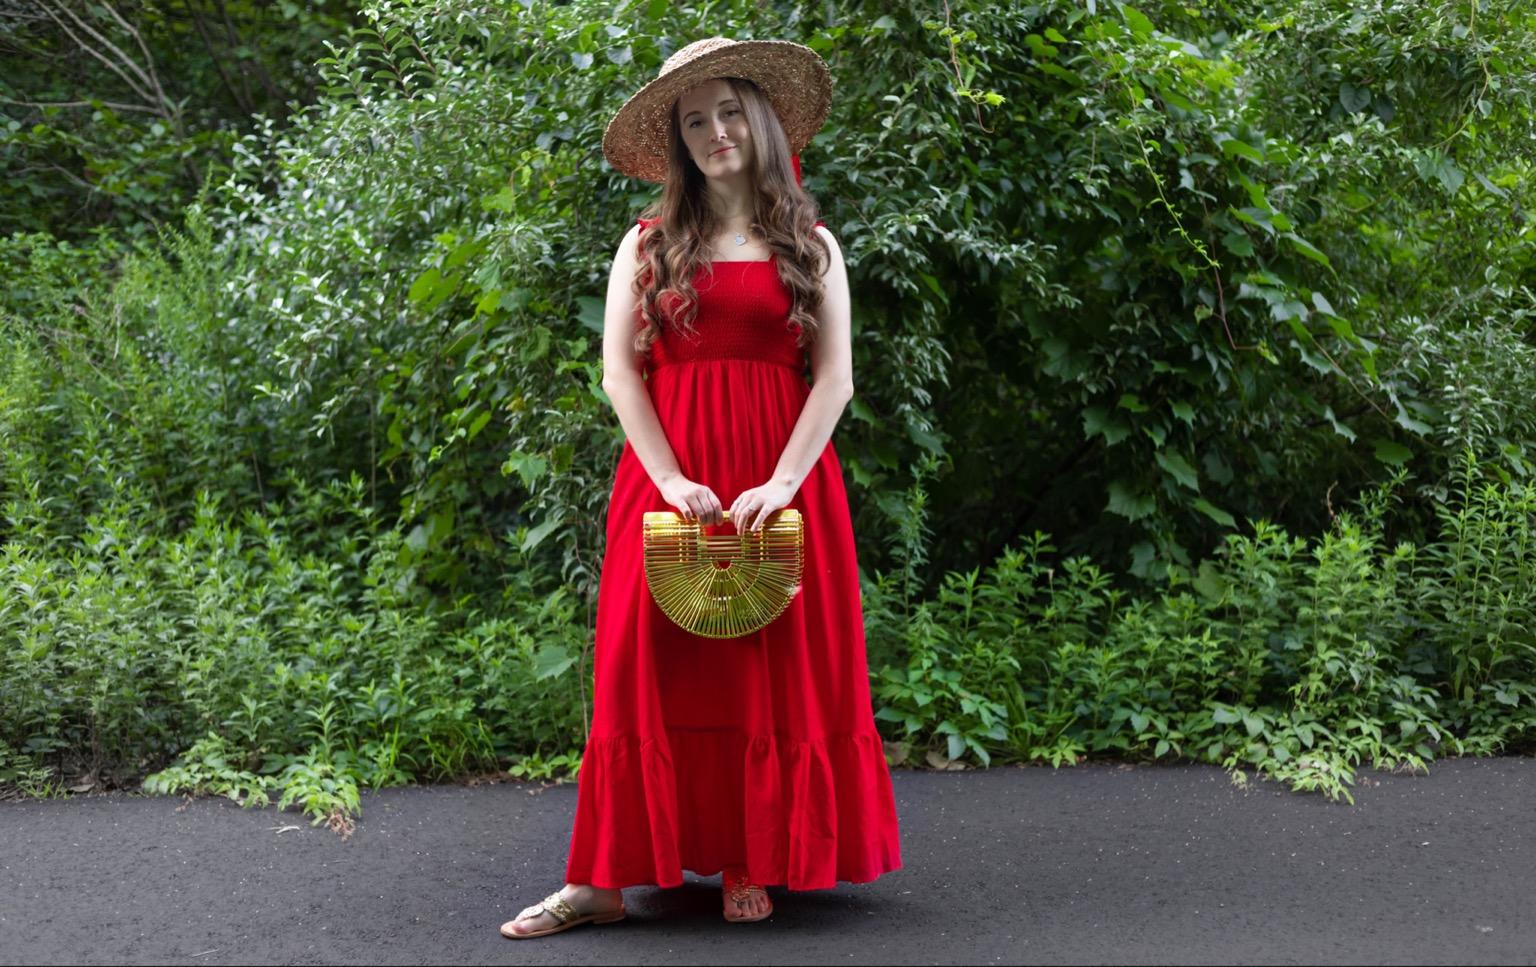 PinkBlush Women's Dress Haul & Styling by Annie Fairfax